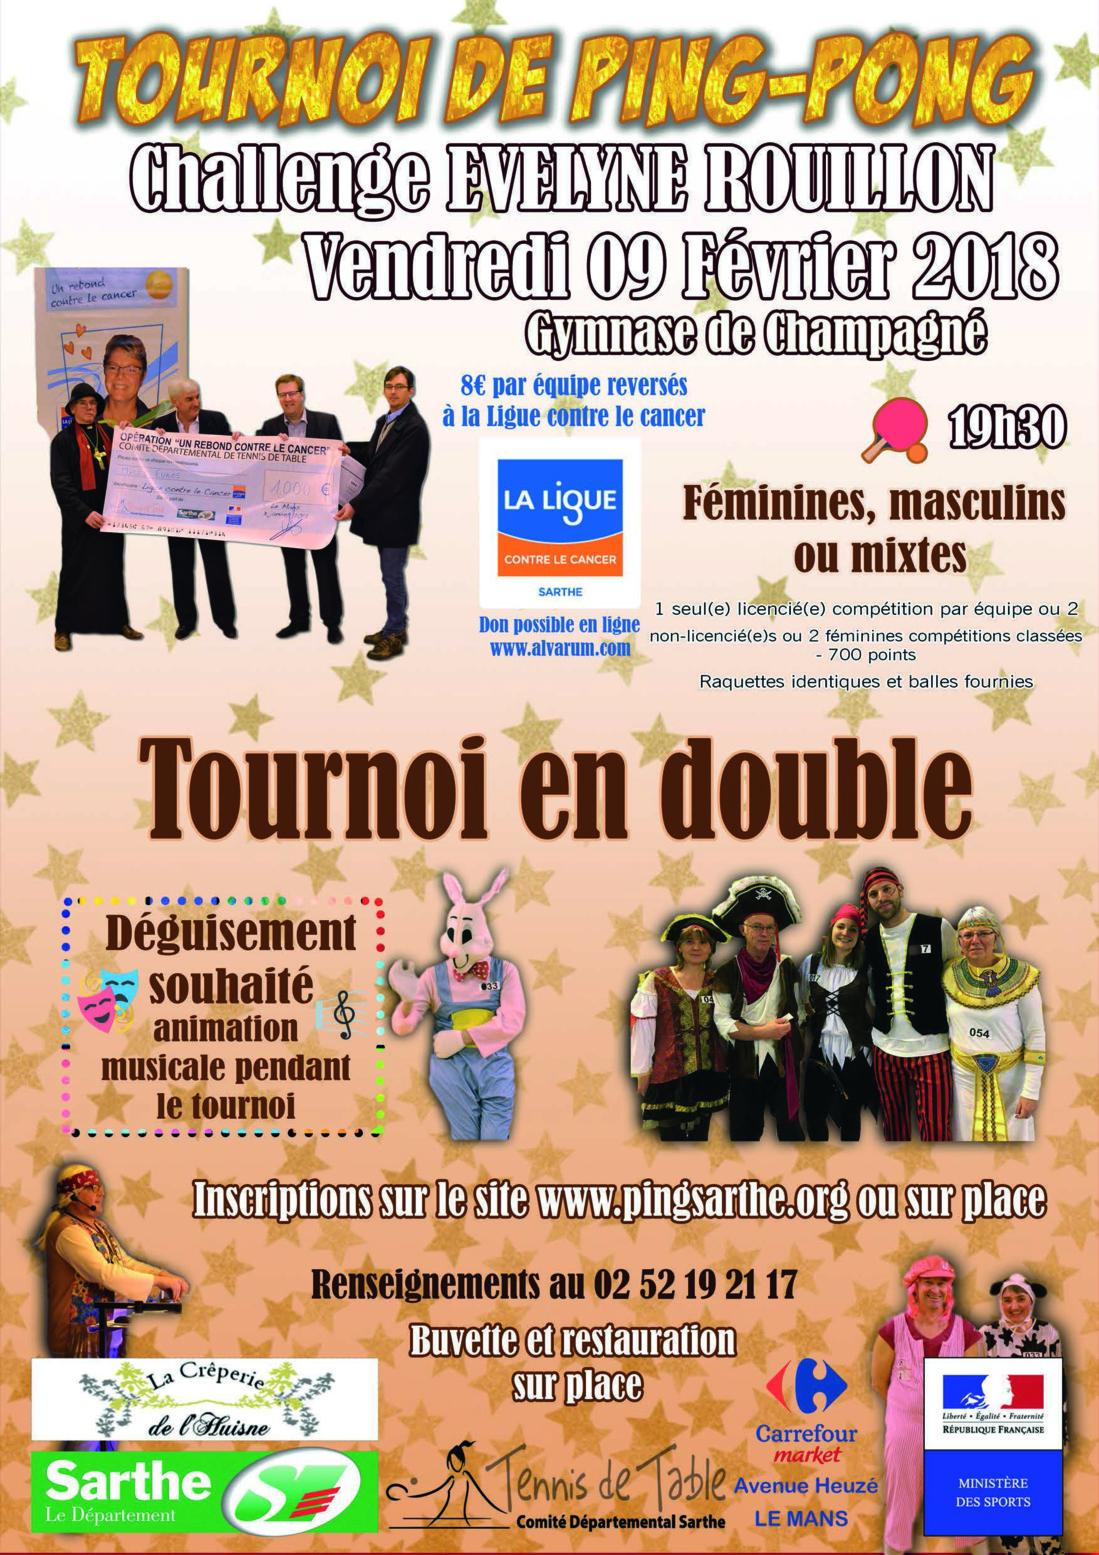 Challenge Evelyne Rouillon